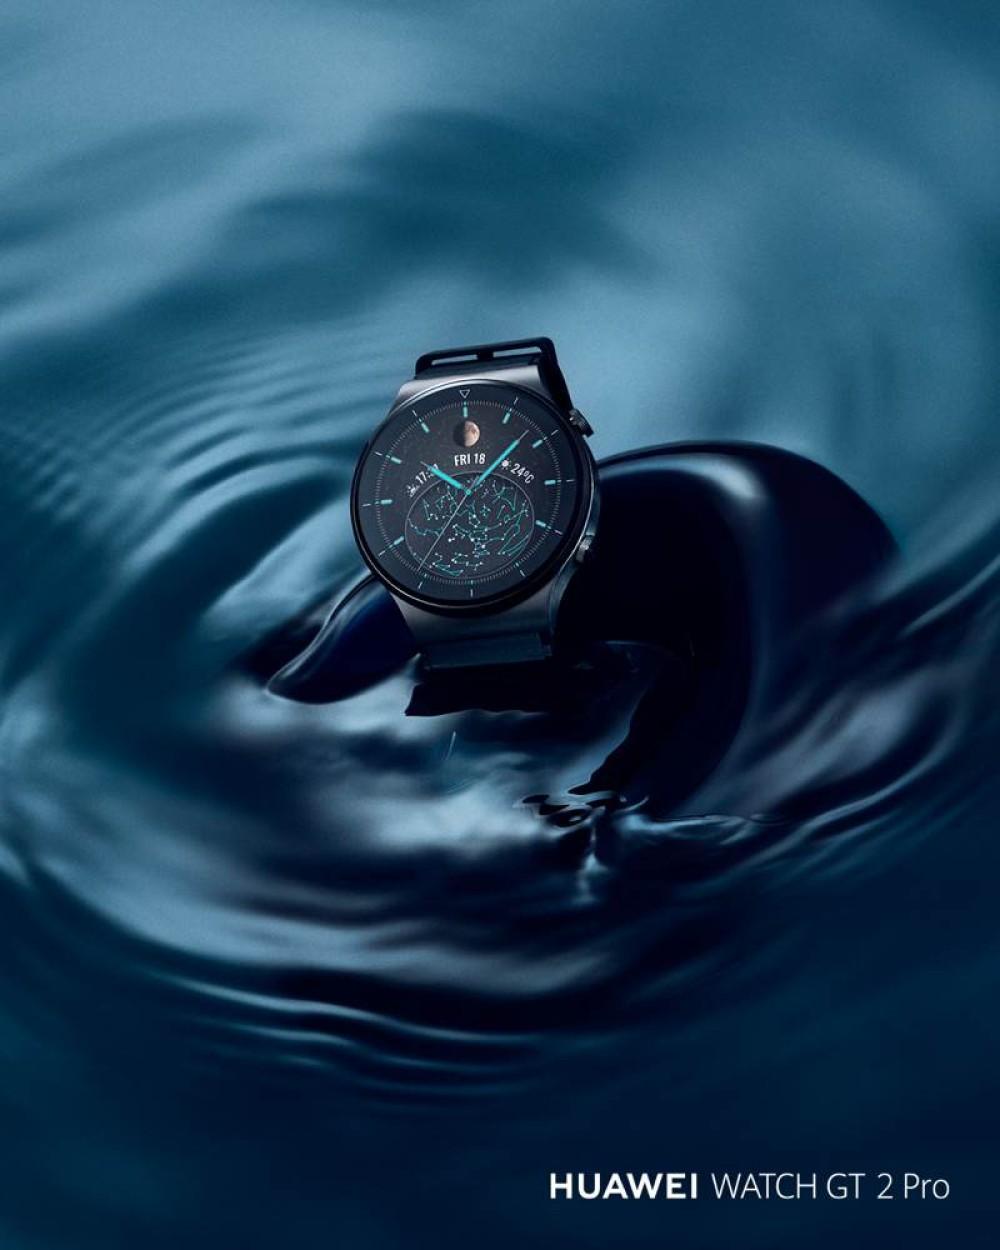 Huawei Watch GT 2 Pro: Επίσημο με ασύρματη φόρτιση και 2 εβδομάδες αυτονομία